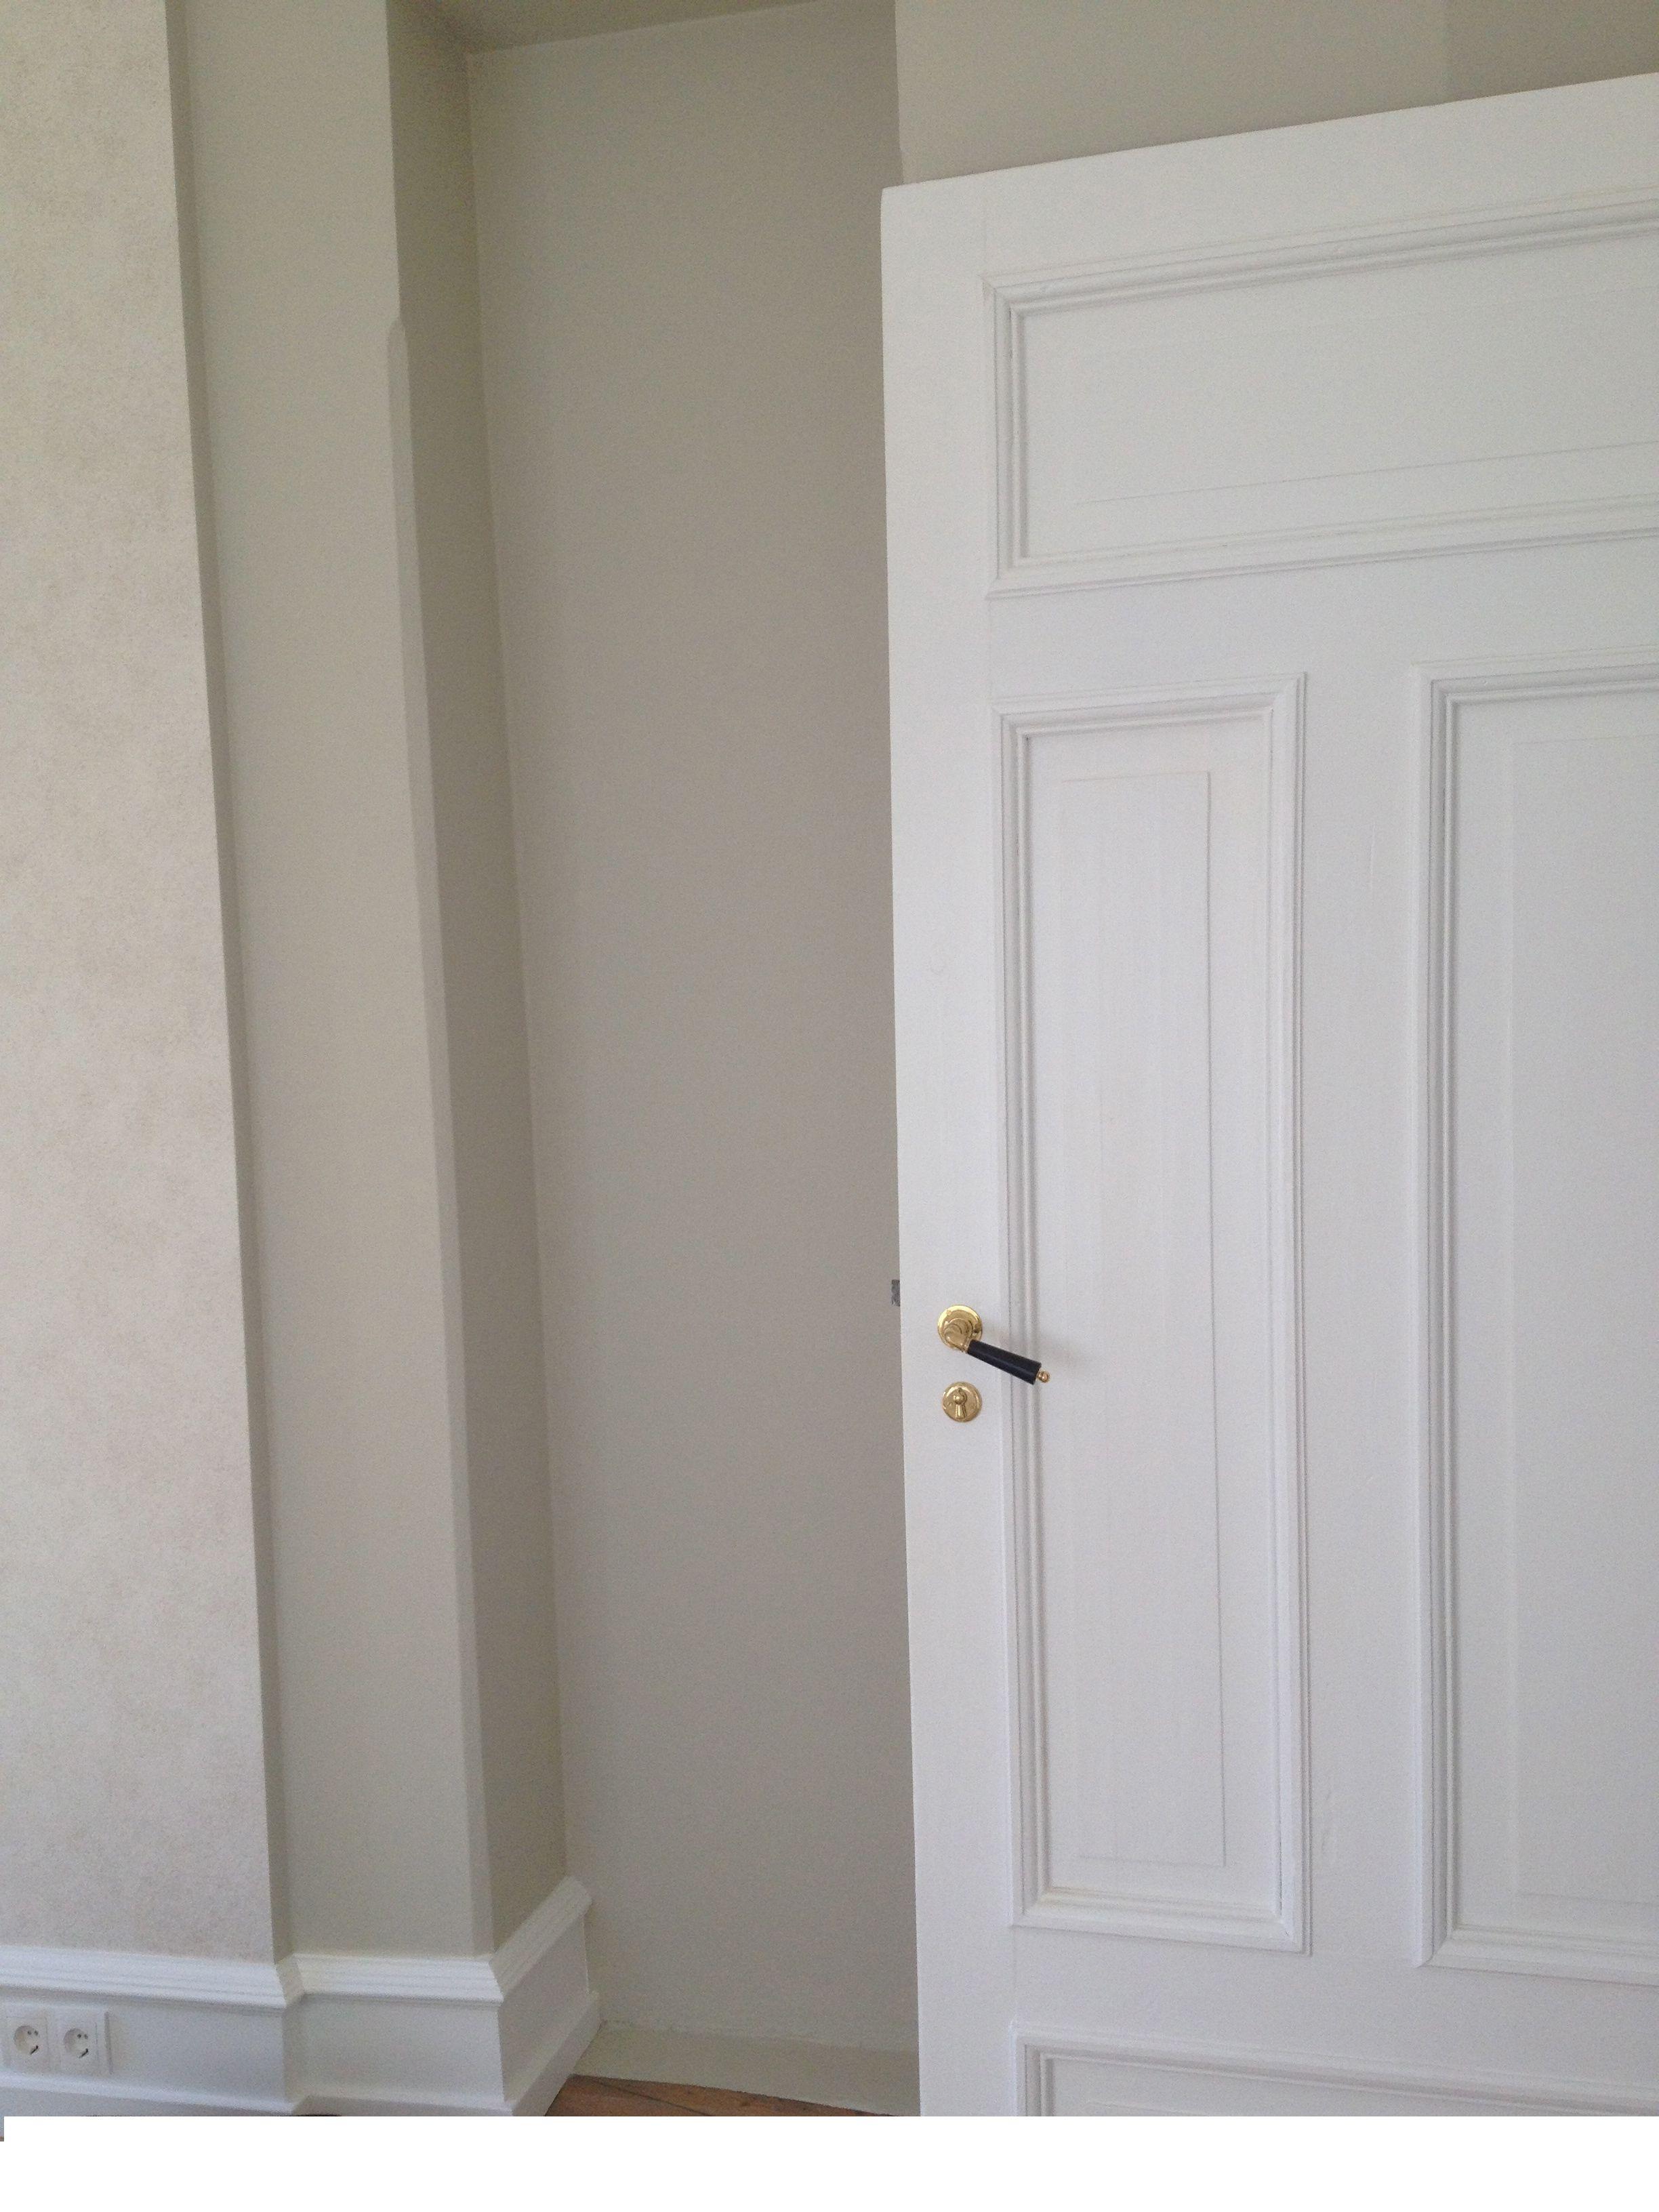 farrow ball shaded white and all white farrow ball pinterest farrow ball greige. Black Bedroom Furniture Sets. Home Design Ideas